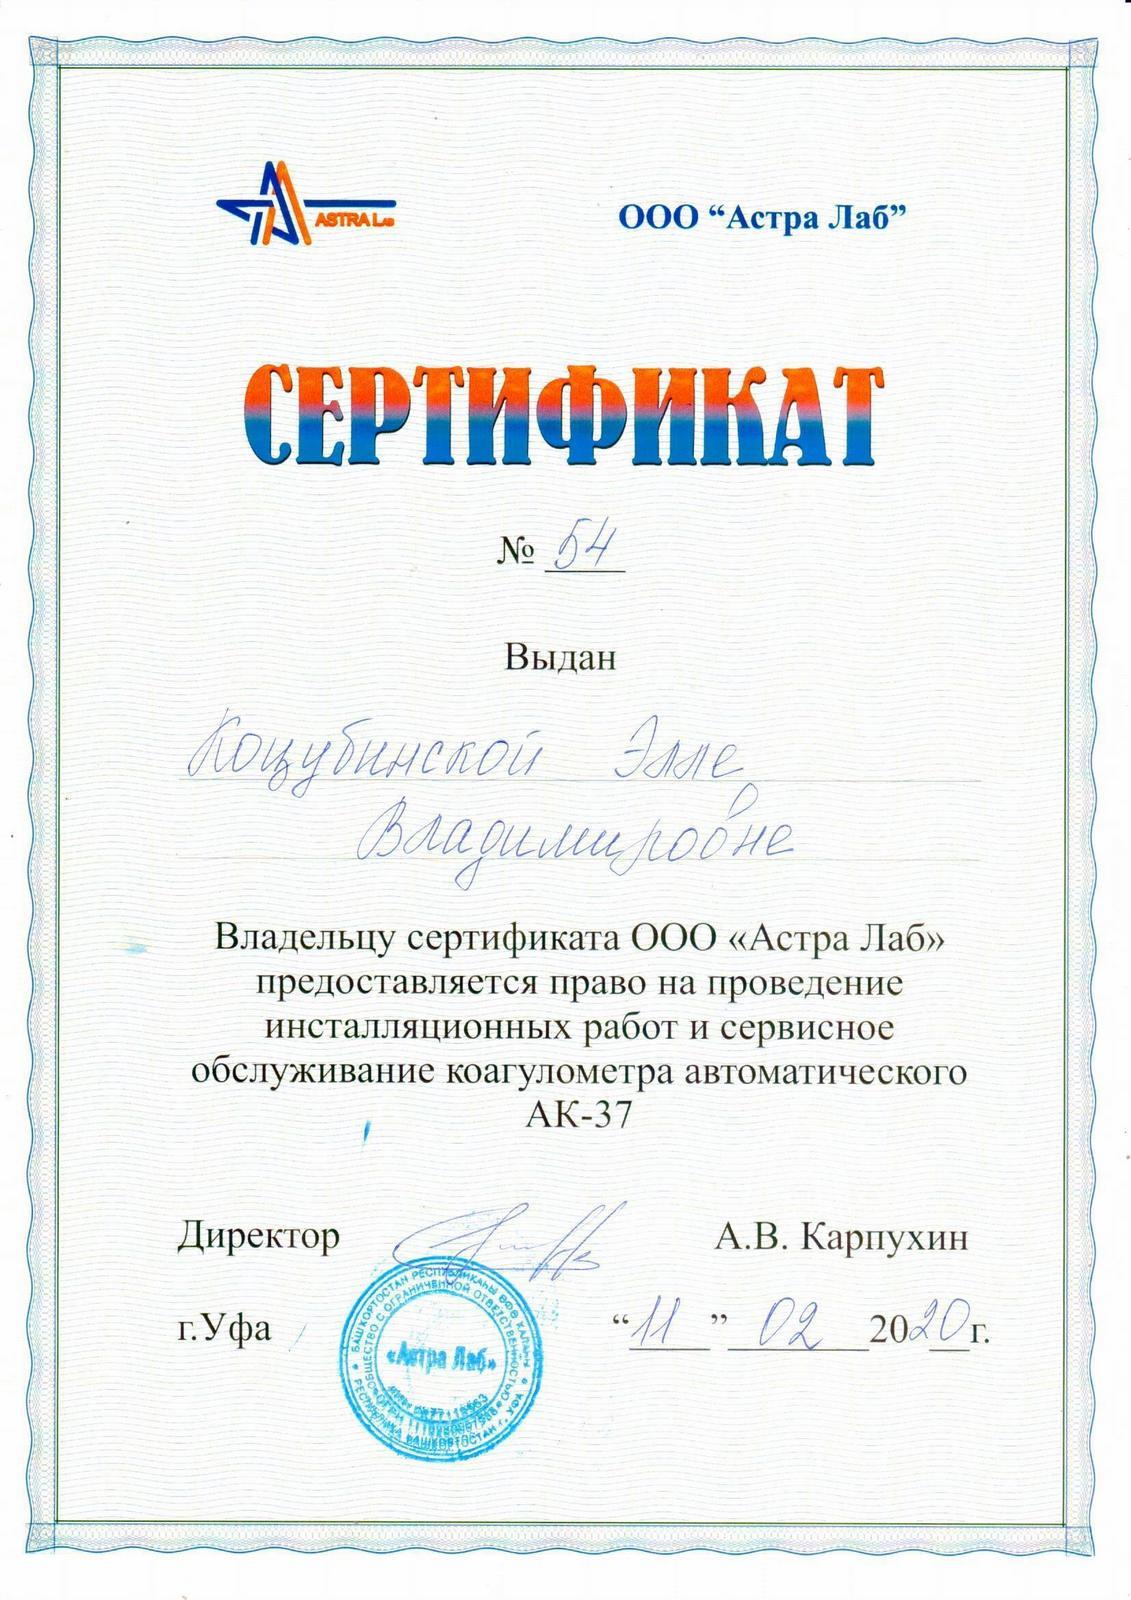 gemodializ - Astra-Lab-Kotsubinskaya-11.02.2020